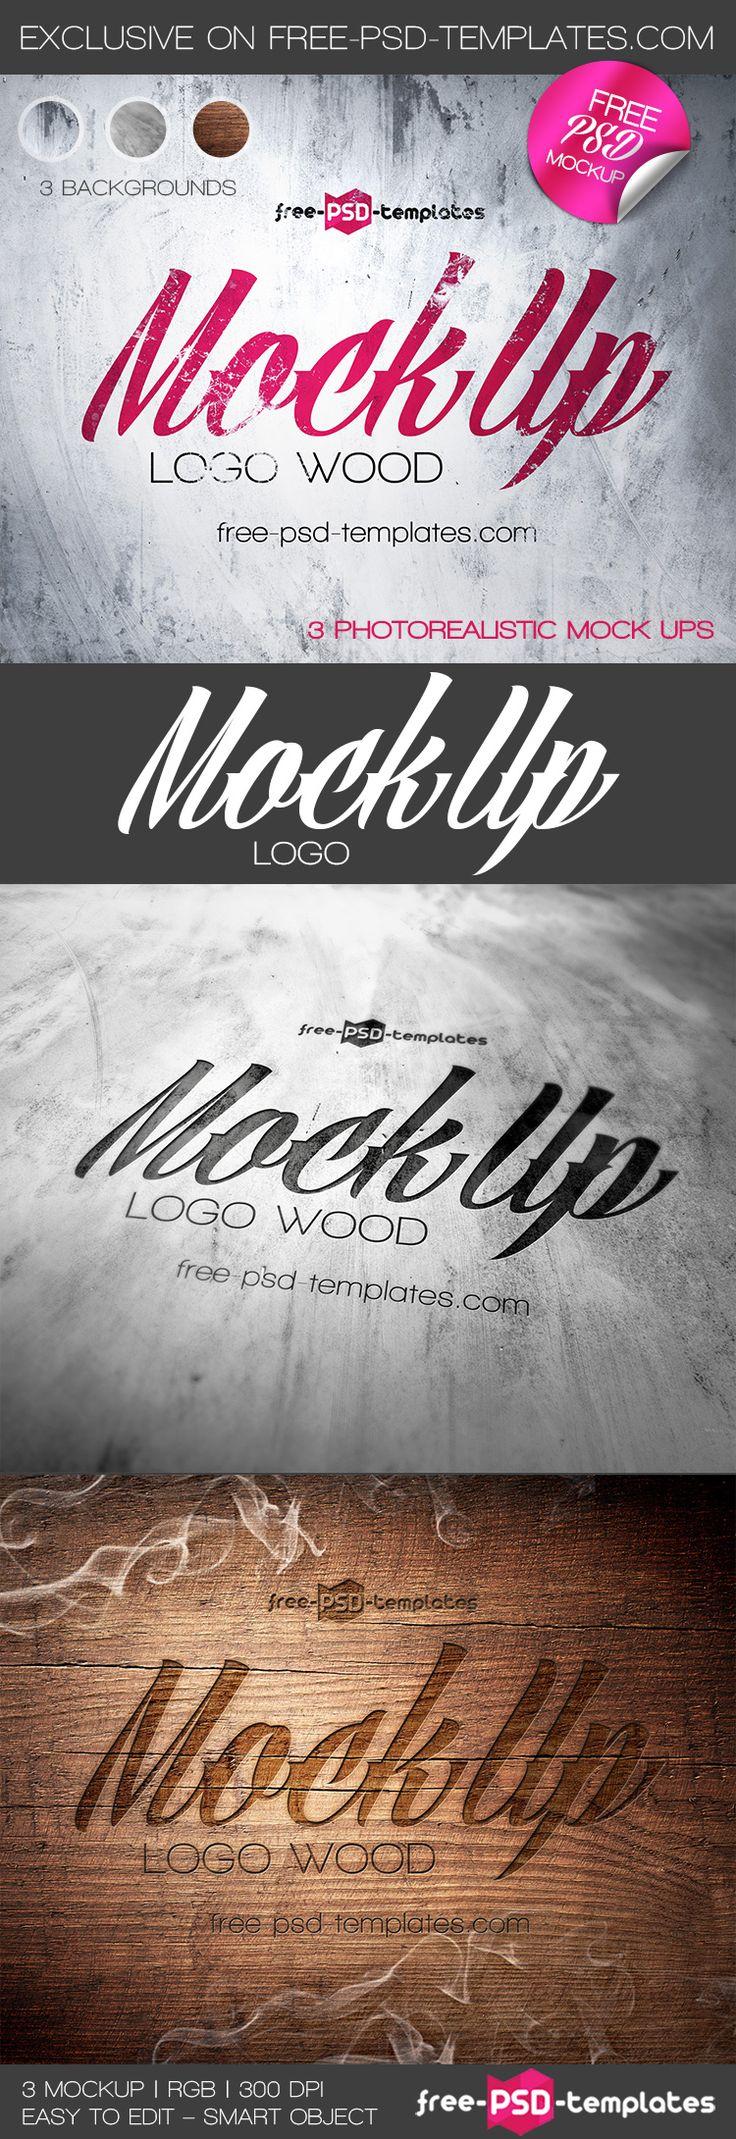 best ideas about logos logos gratis 3 logo mock up in psd psd templates